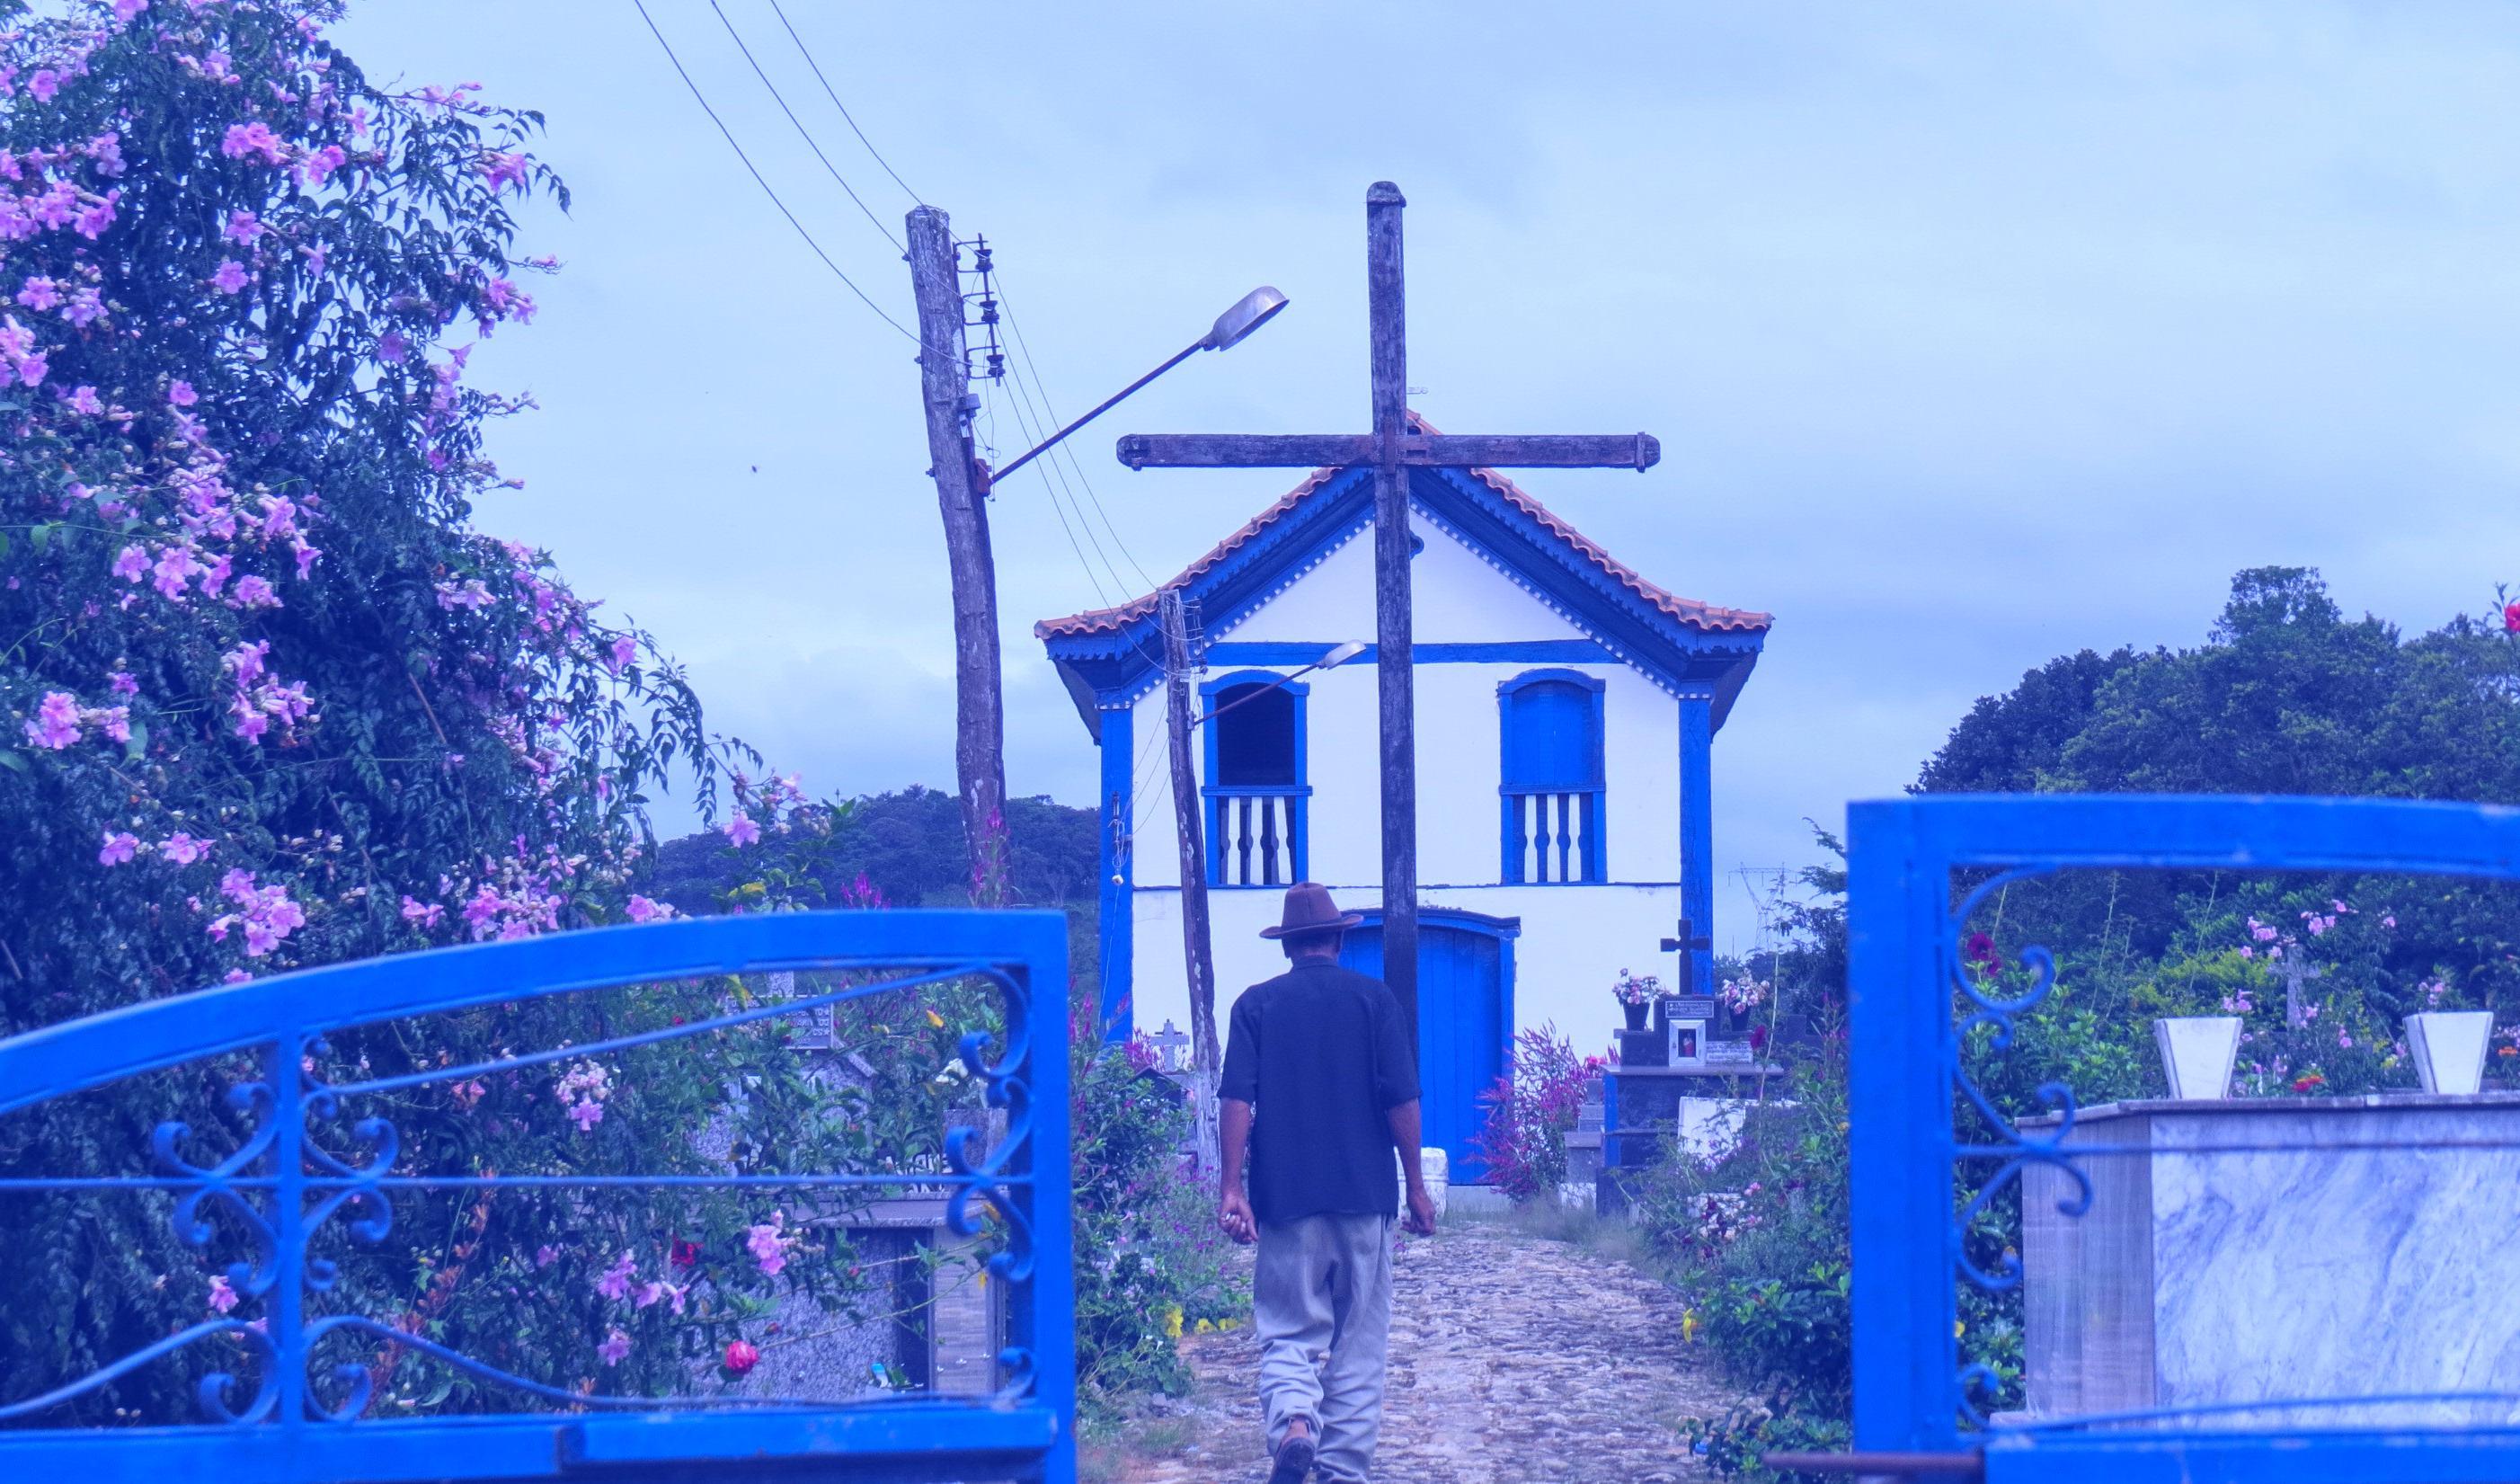 Mei Microempreendedor em Bom Jesus do Amparo, MG